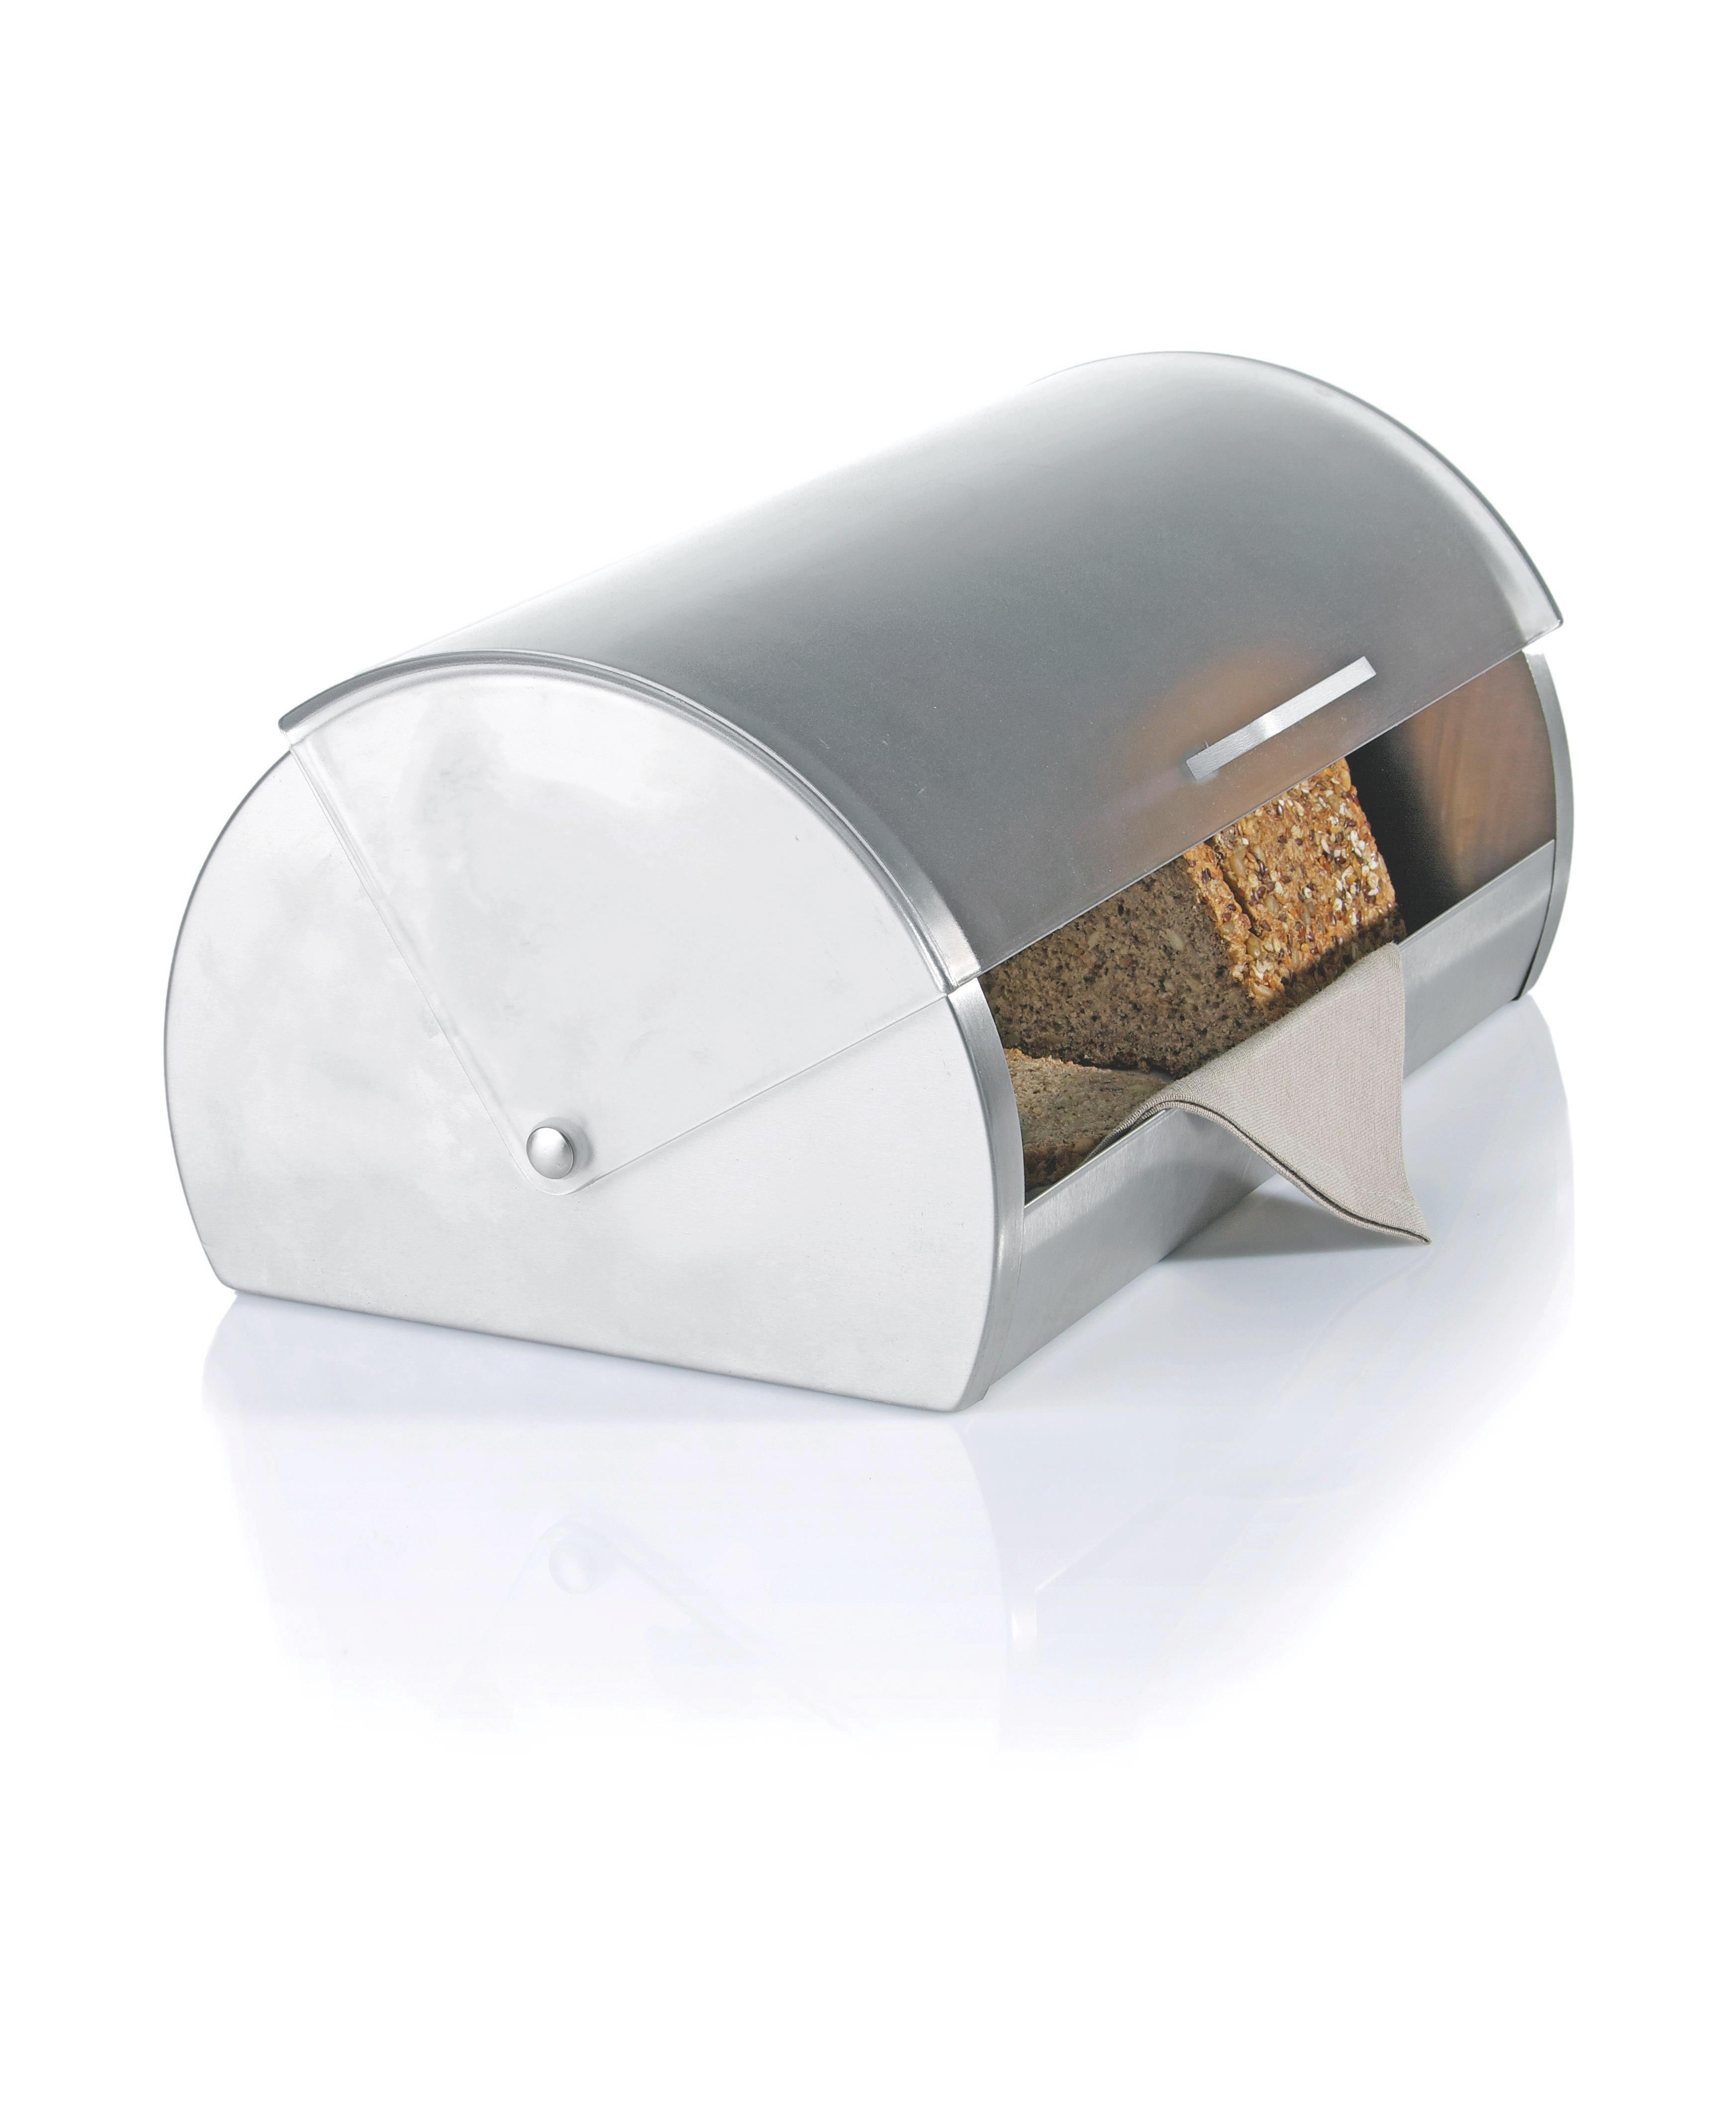 Brotdose Grau - Klar/Edelstahlfarben, Kunststoff/Metall (18,5/28/39,2cm) - MÖMAX modern living